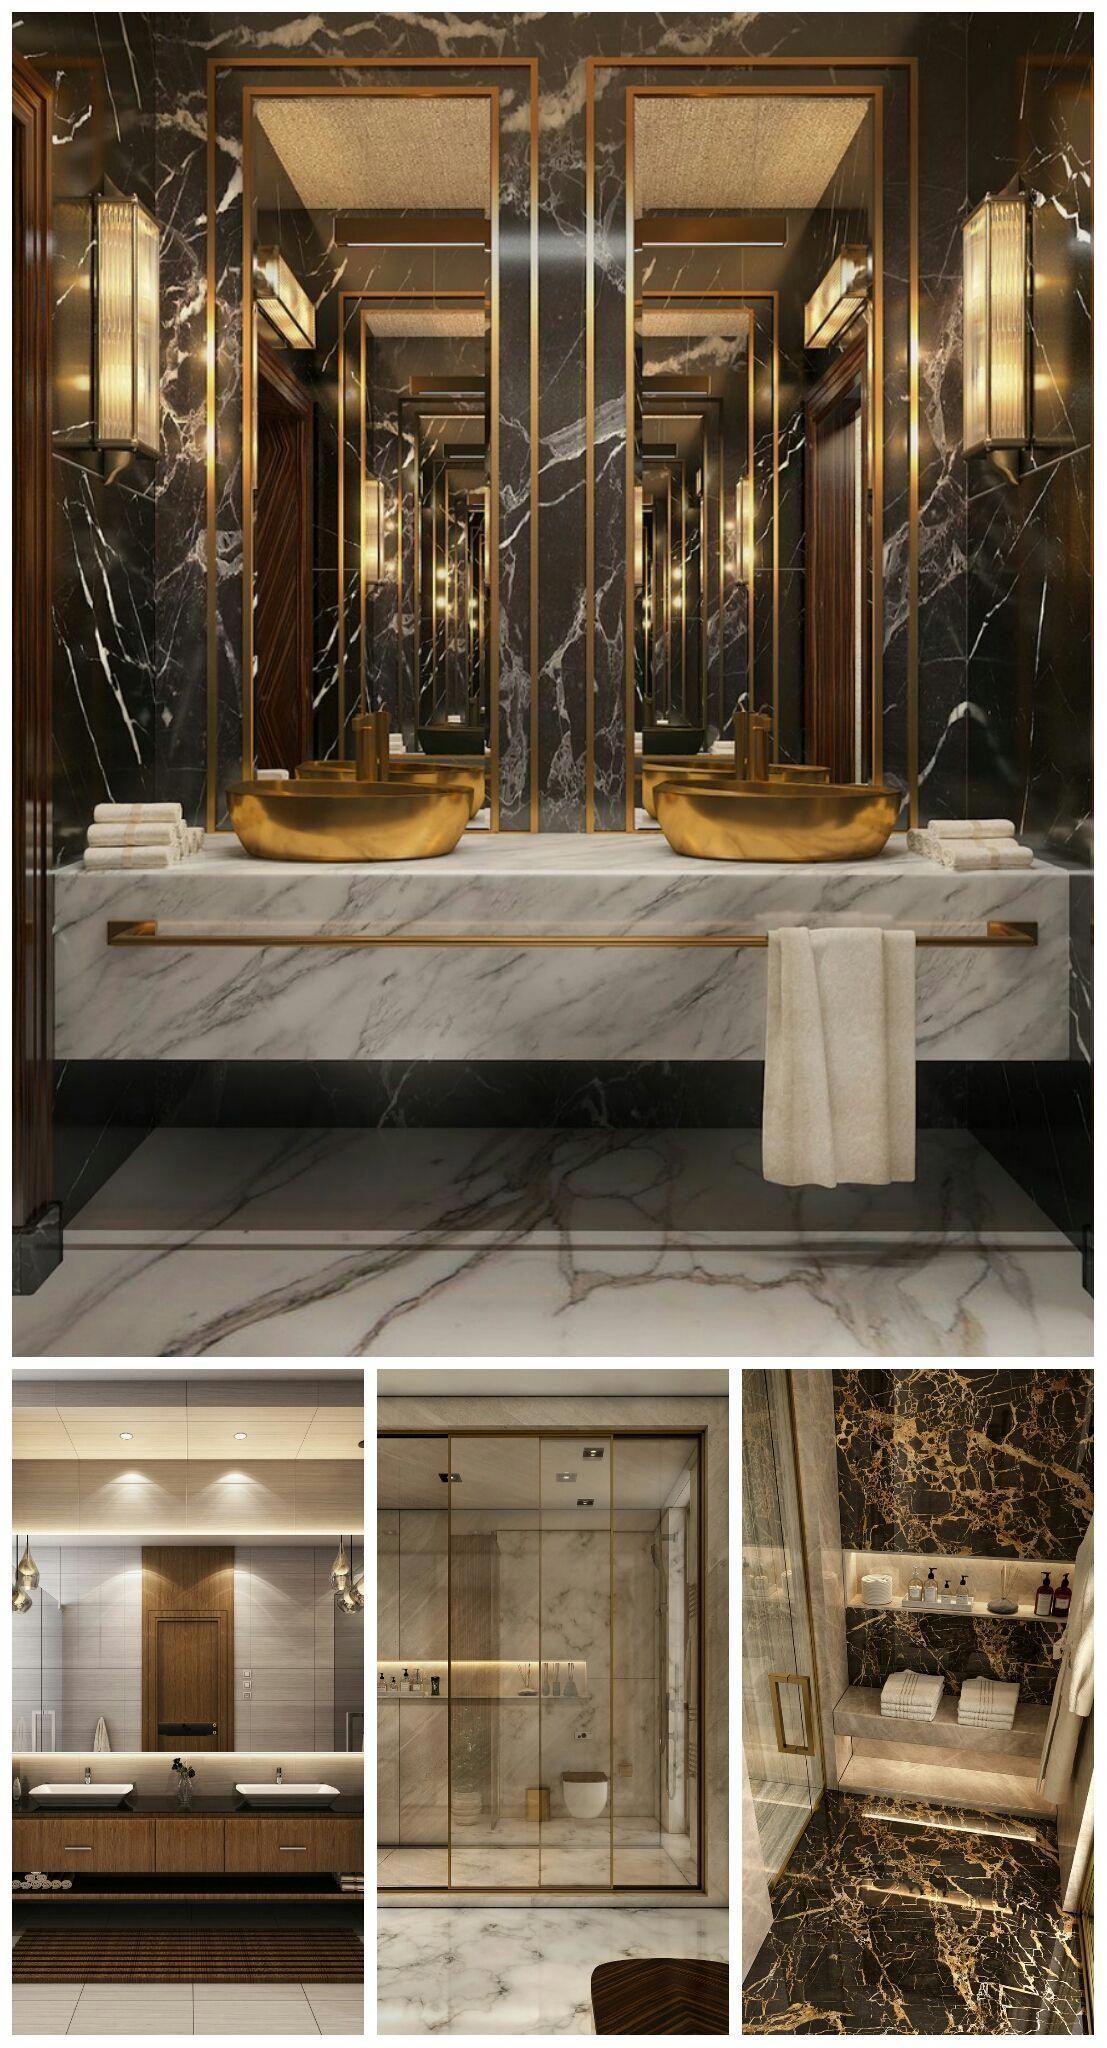 Katalog Luxxu Modernes Design Und Wohnen Design Katalog Luxxu Modernes Und Wohnen In 2020 Luxusbadezimmer Beleuchtungsideen Coole Beleuchtung